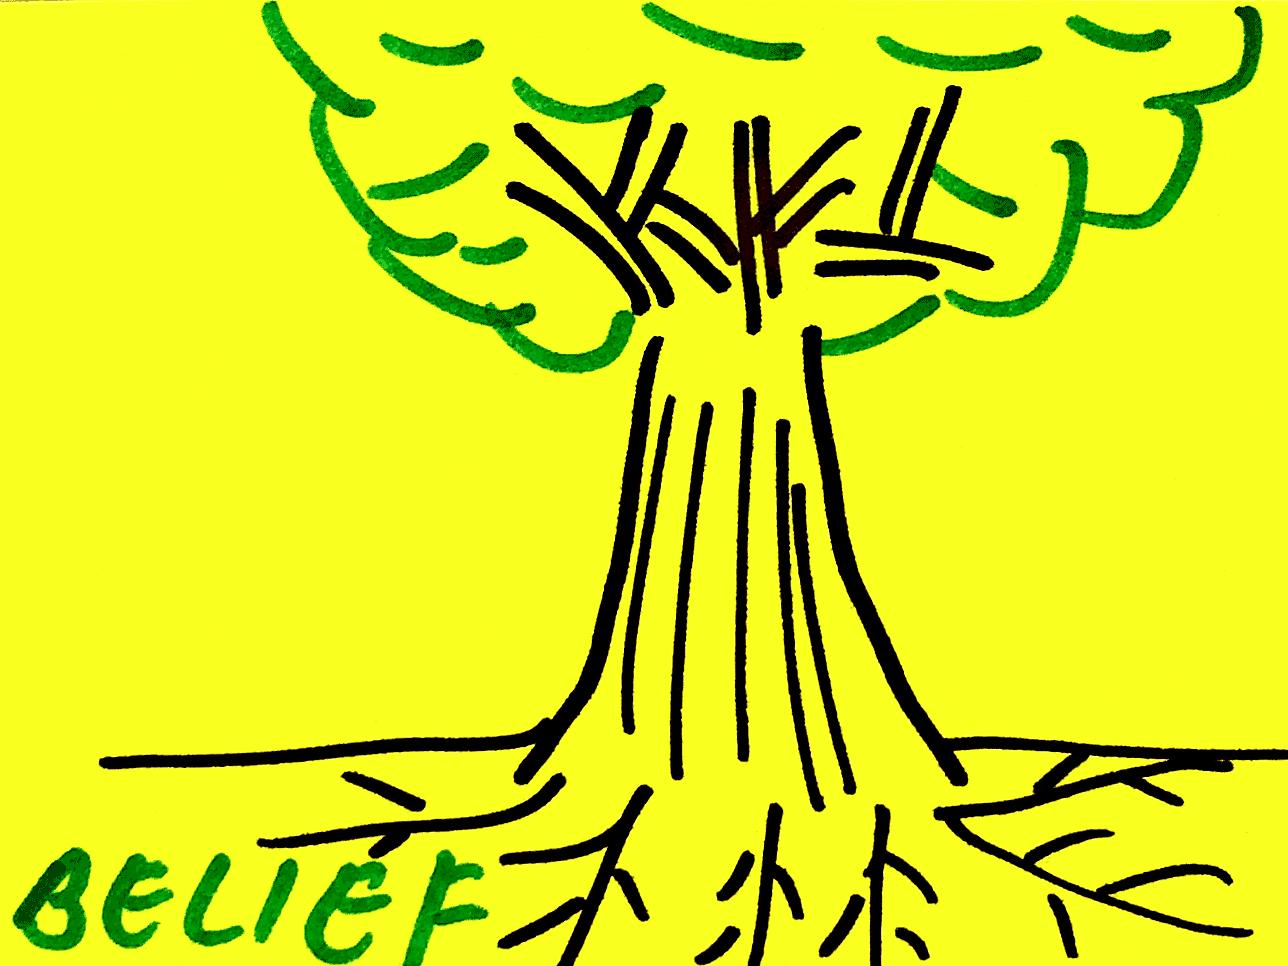 Belief Strengthsfinder Tree Roots Values